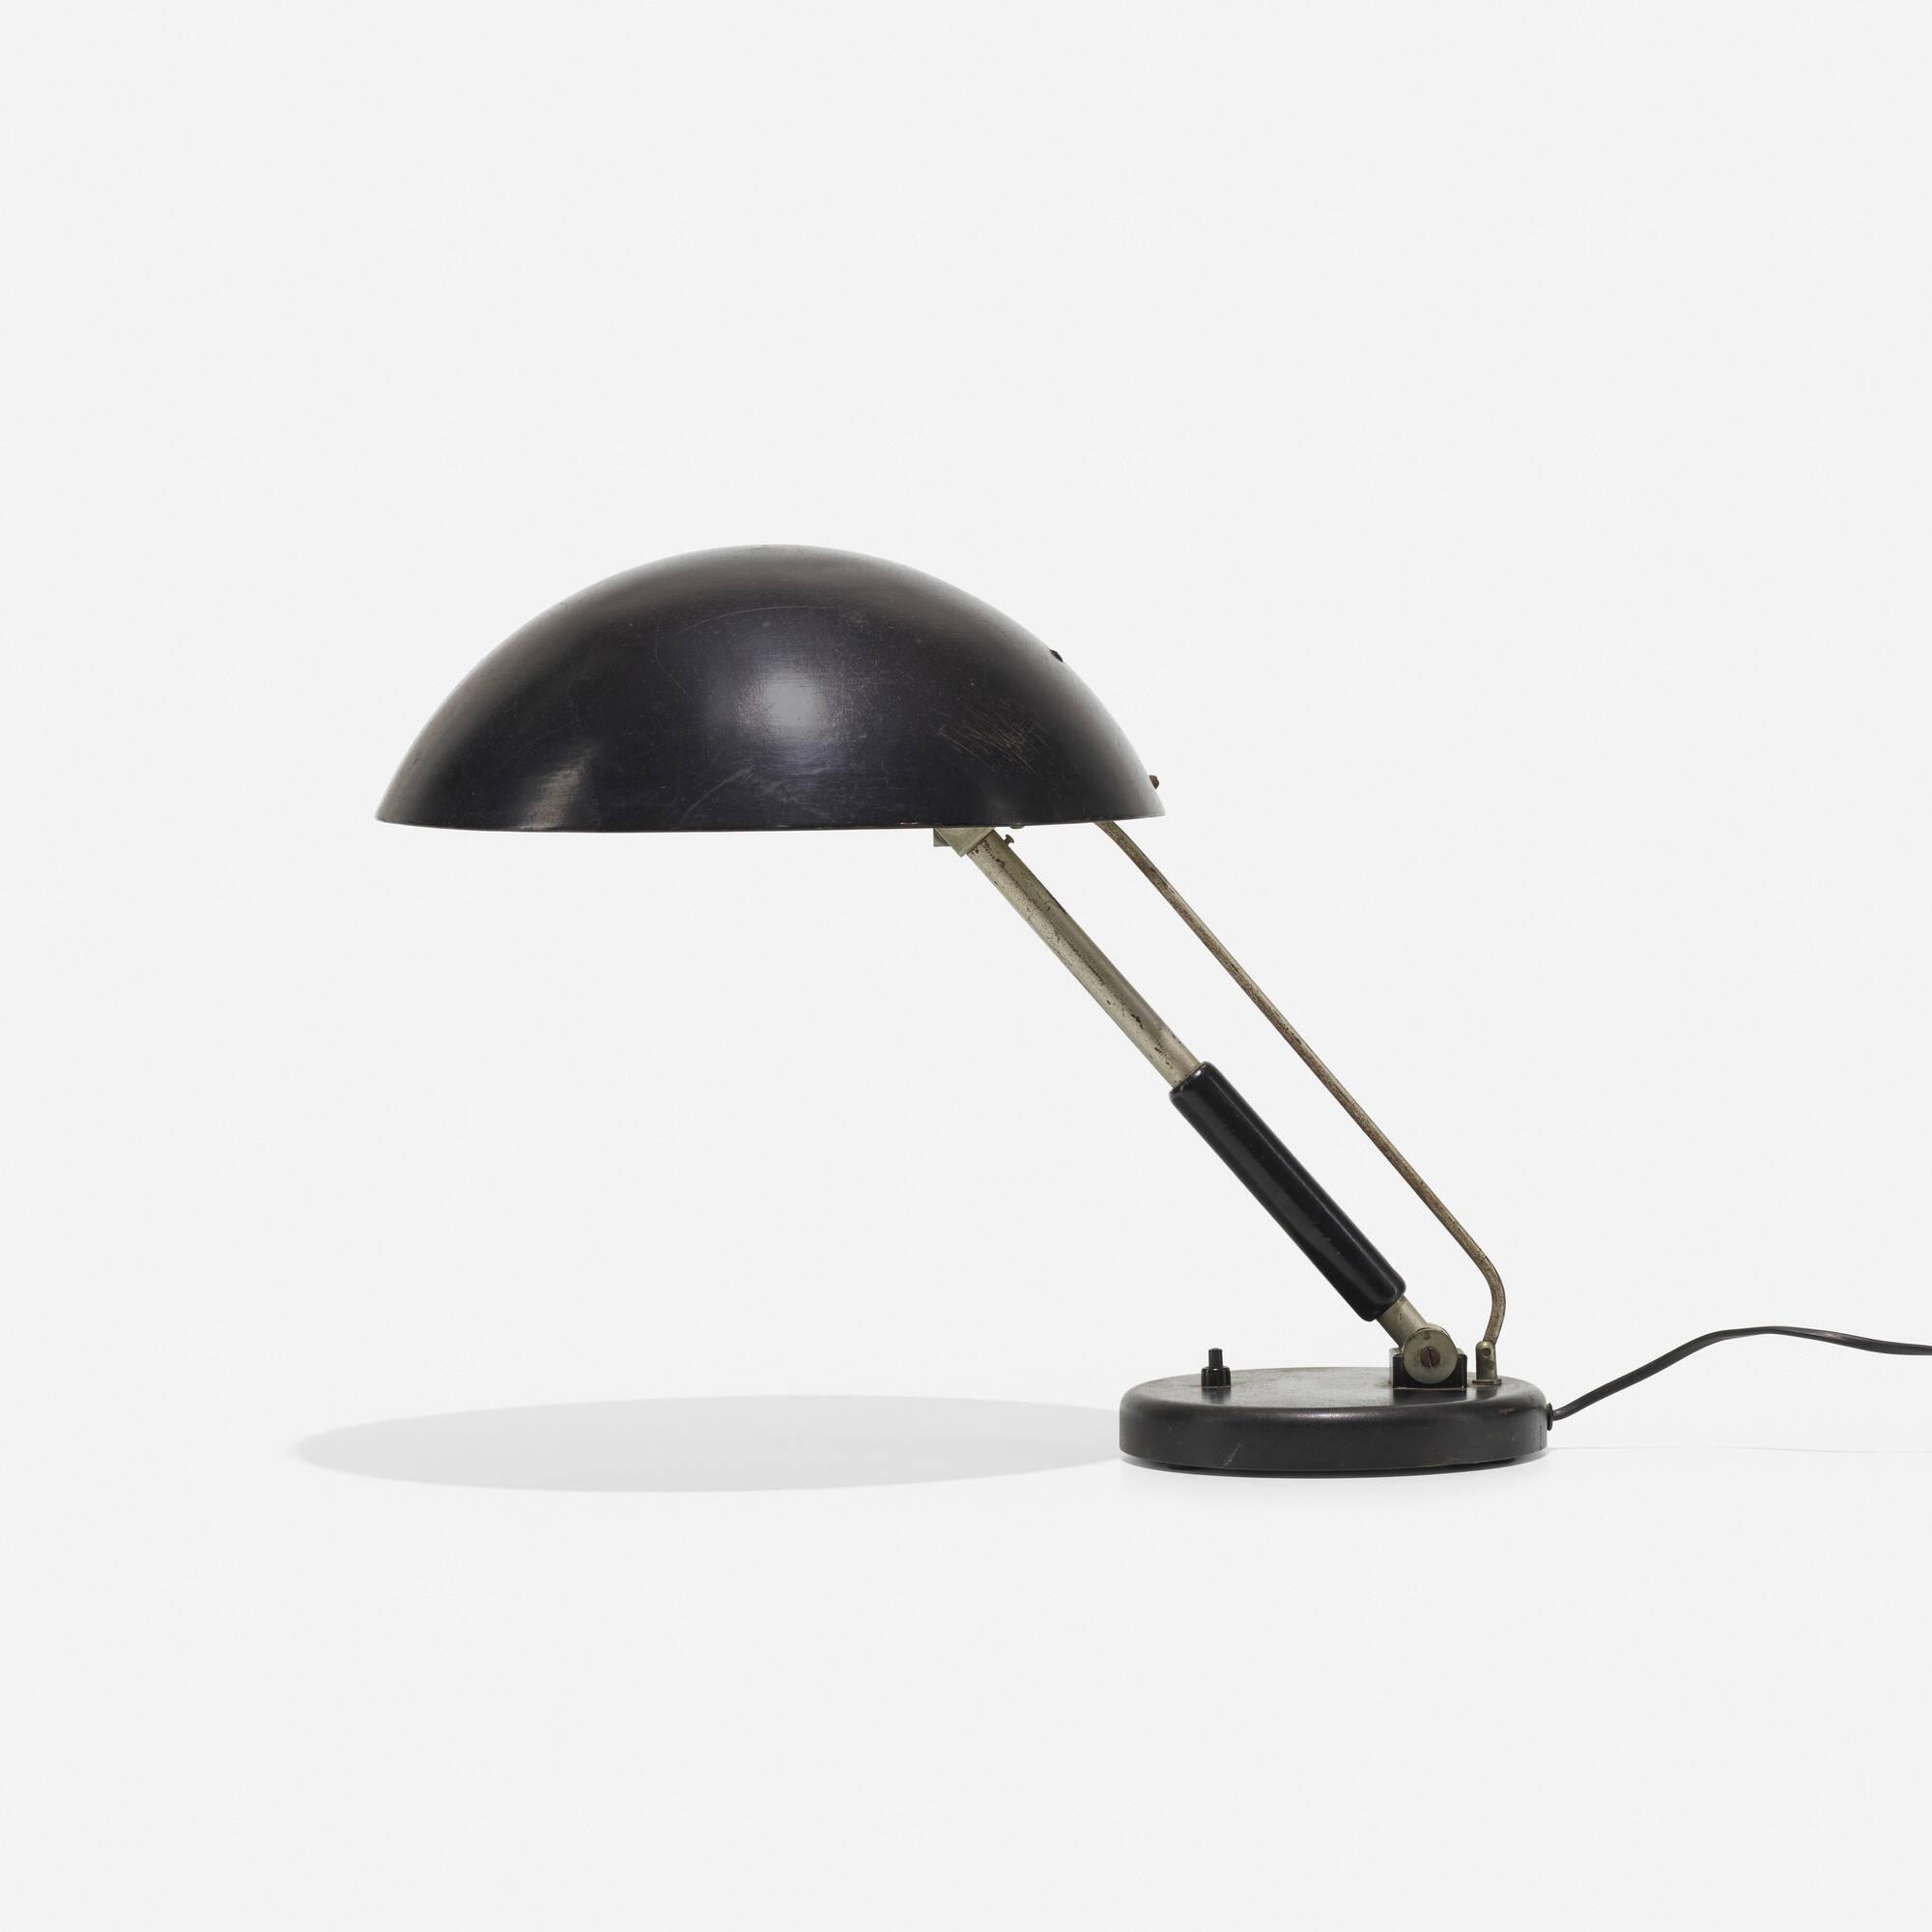 305: Karl Trabert / table lamp (1 of 2)